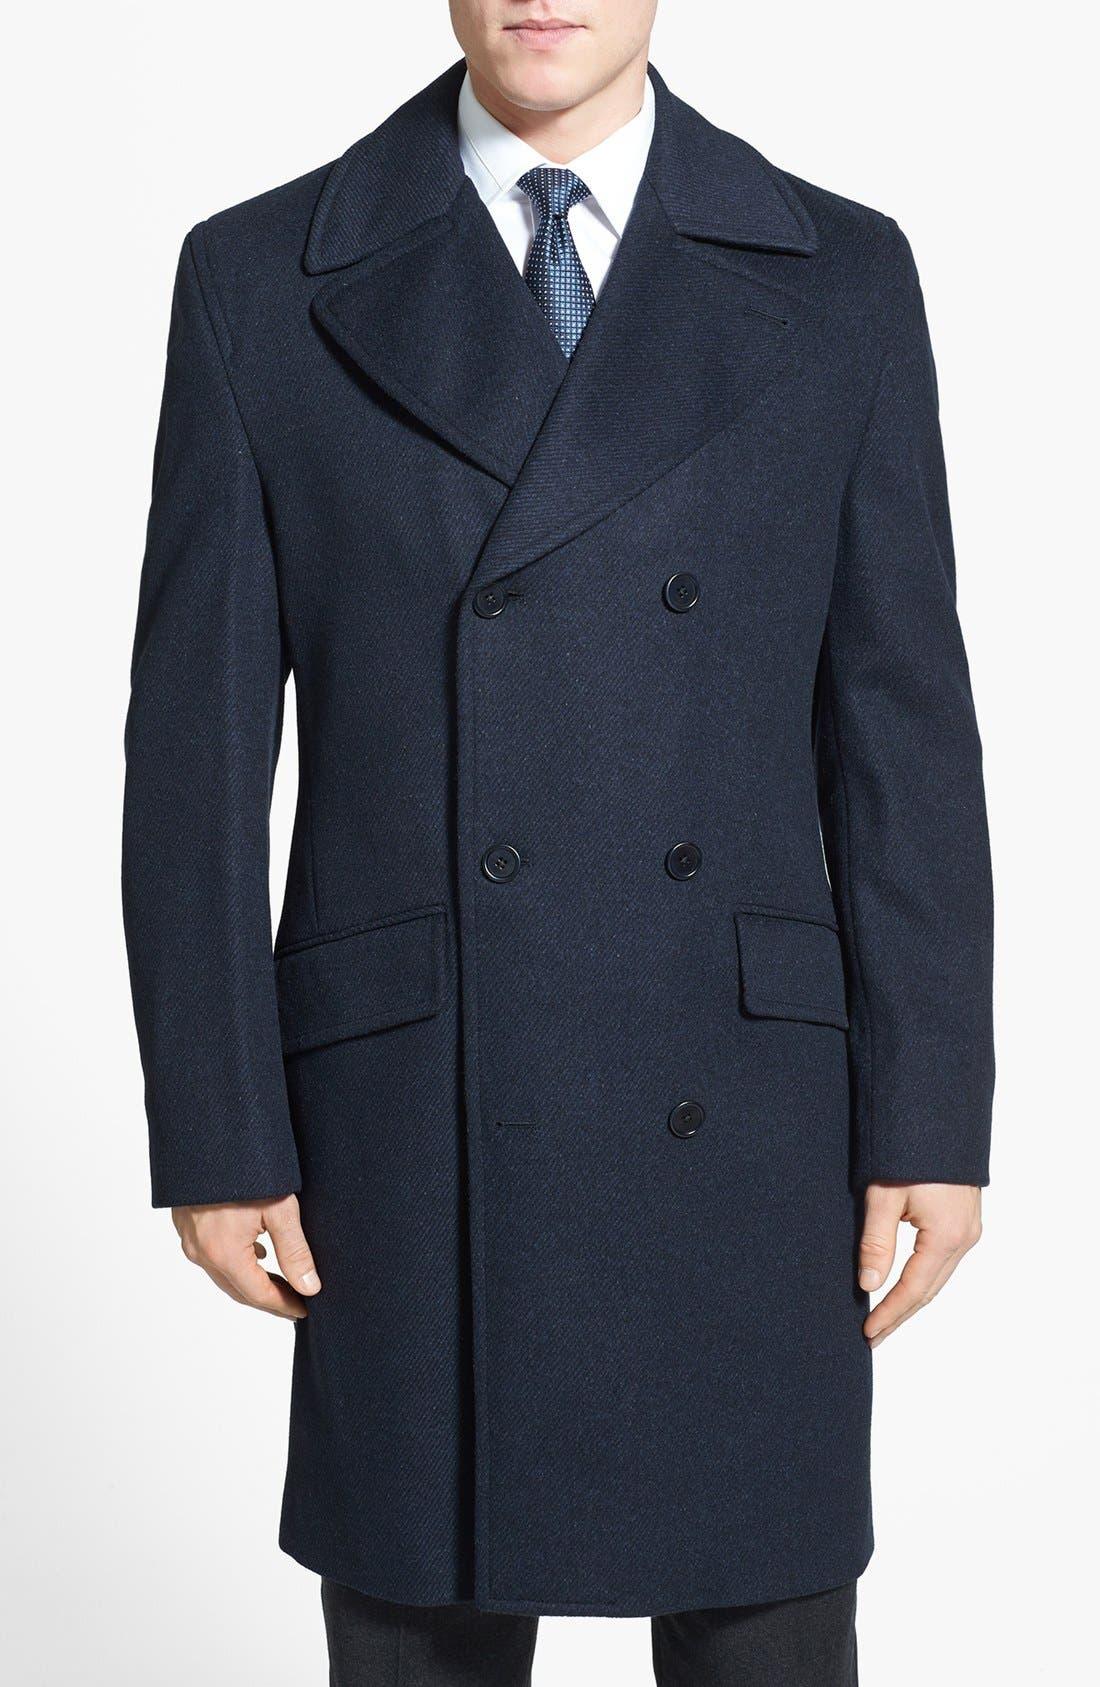 Alternate Image 1 Selected - Cardinal of Canada Wool Blend Top Coat